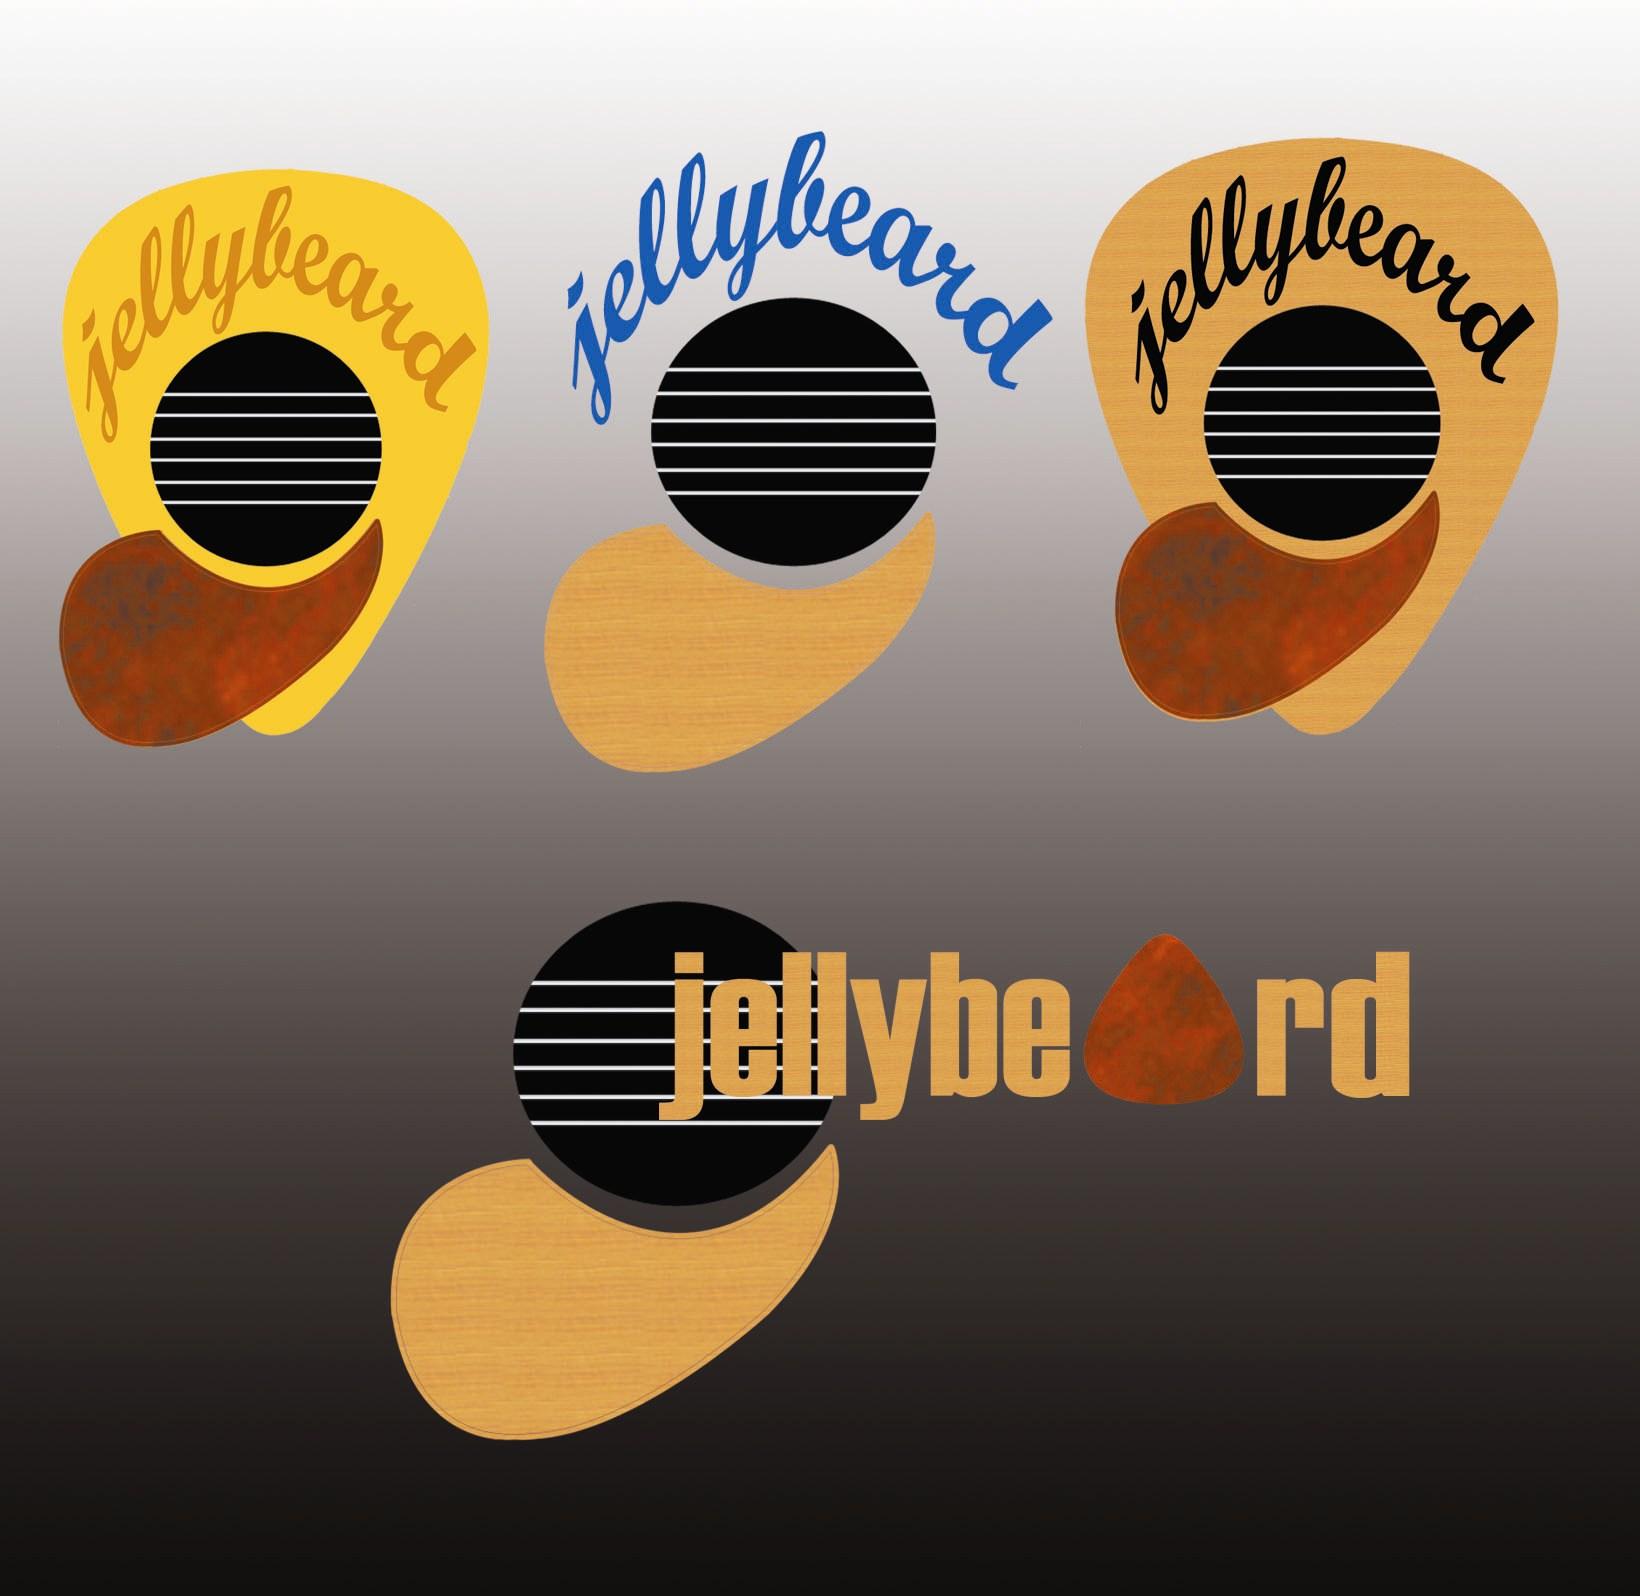 Logo Design by Arqui ACOSTA - Entry No. 12 in the Logo Design Contest jellybeard Logo Design.